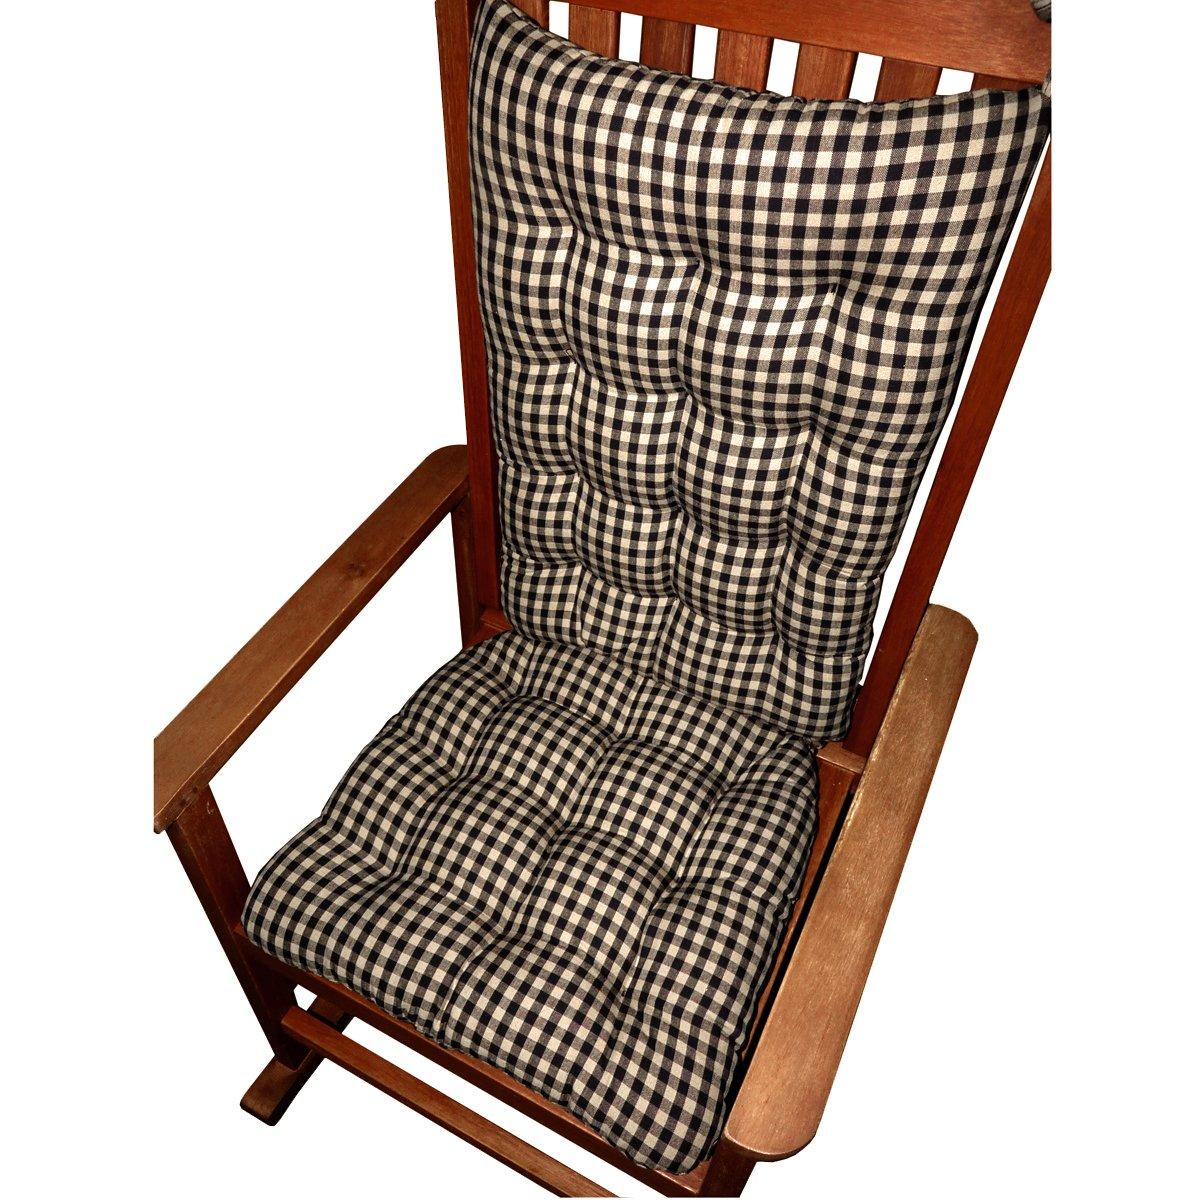 Amazon.com: Rocking Chair Cushions - Checkers Black & White 1/4 ...